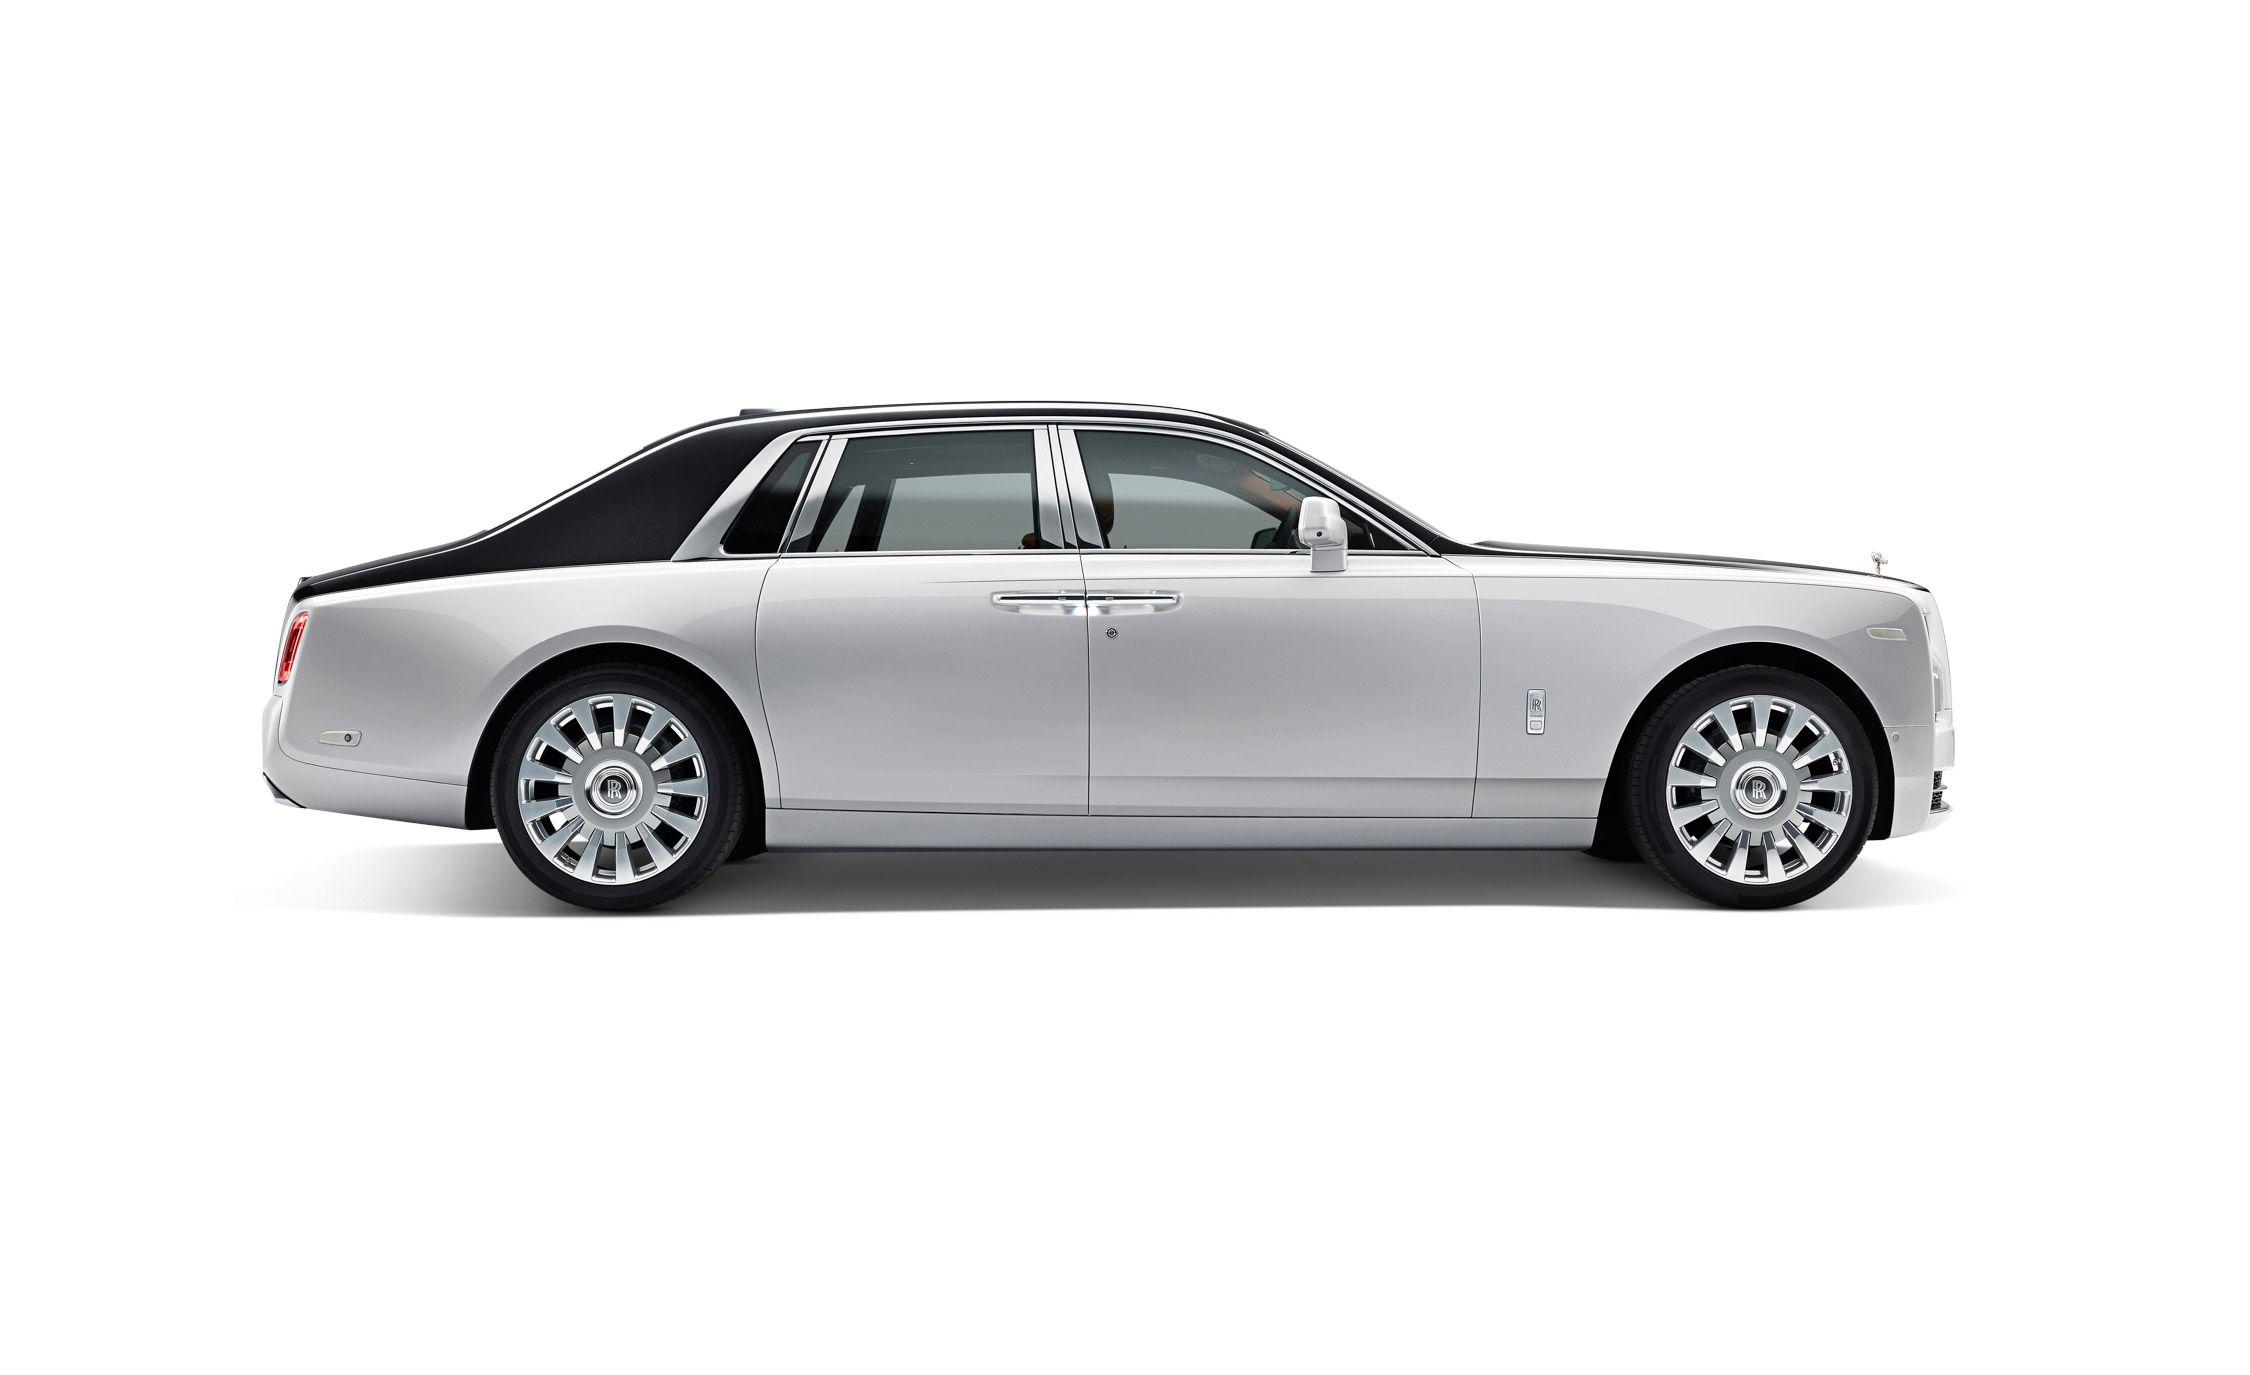 2018 Rolls Royce Phantom VIII Dissected: Interior, Design, Powertrain, And  More